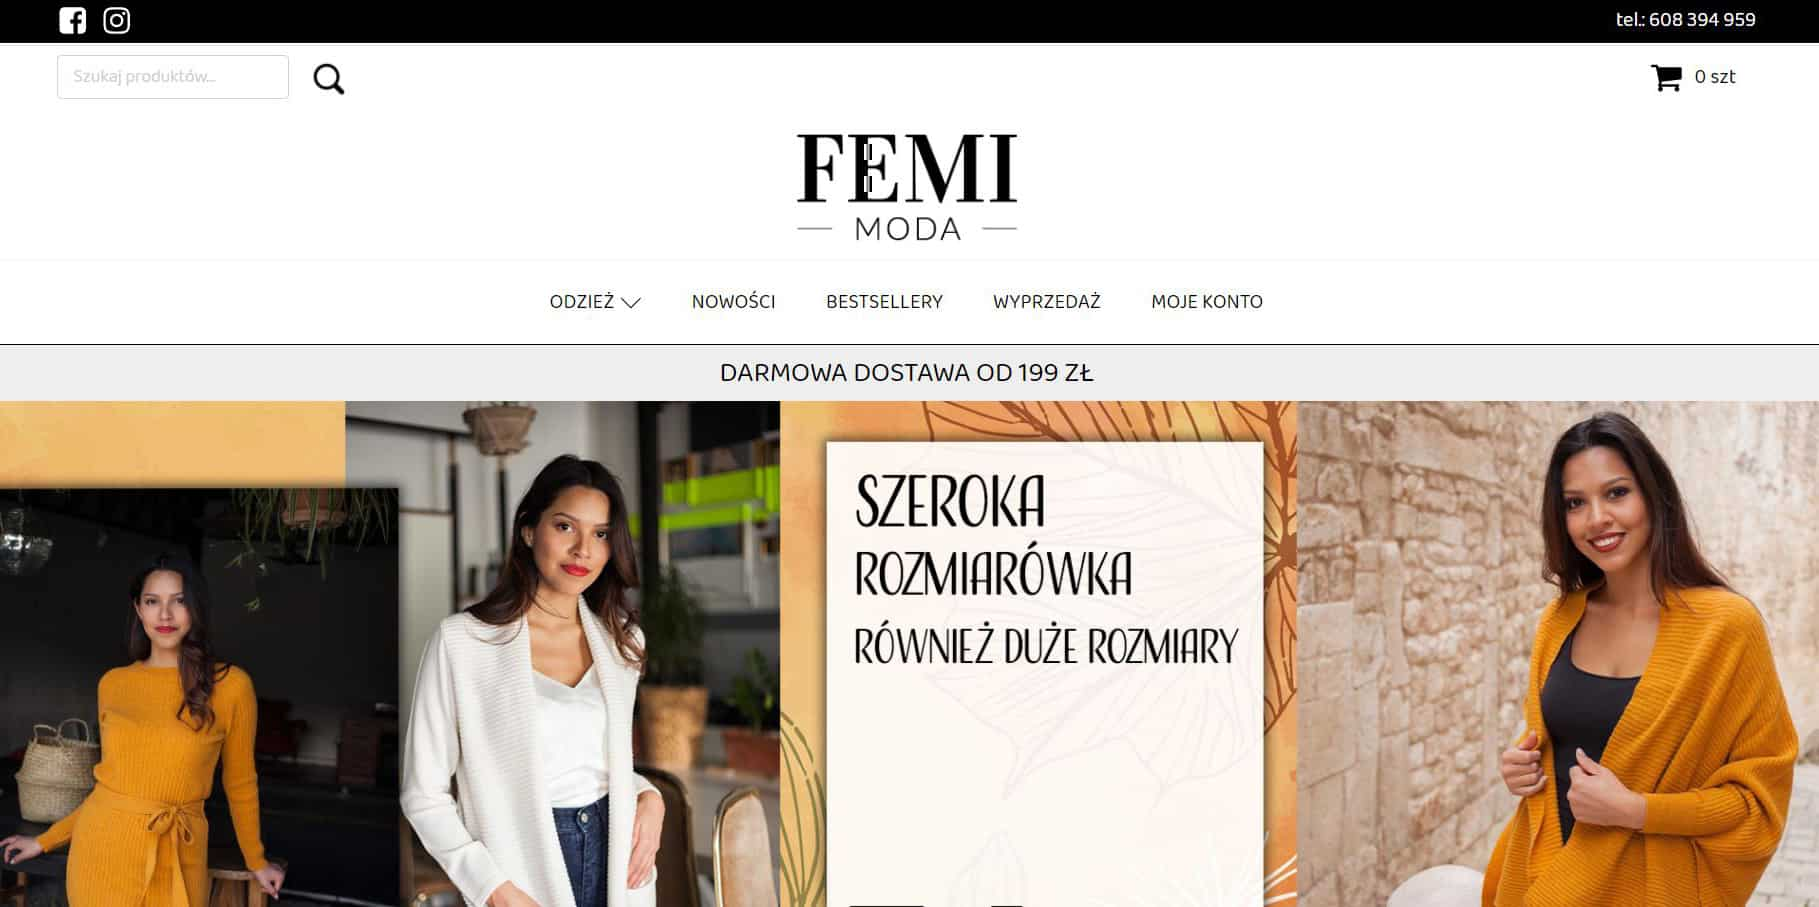 Sklep FEMI MODA - Portfolio SEOSEM24